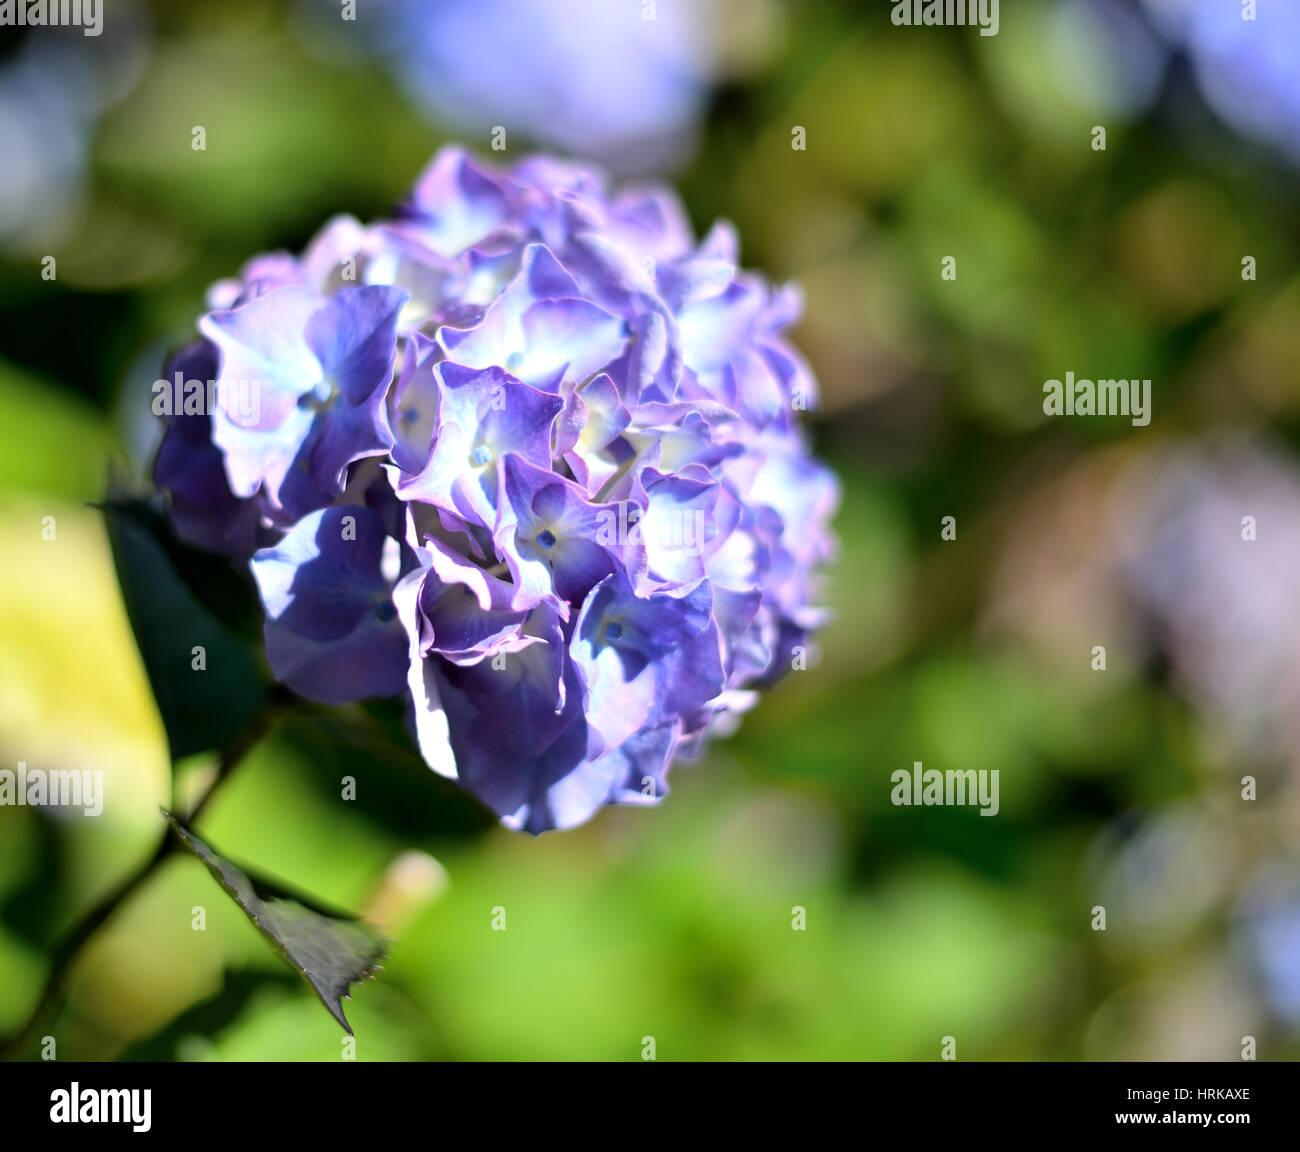 Large blue-purple hydrangea flowerhead - Stock Image